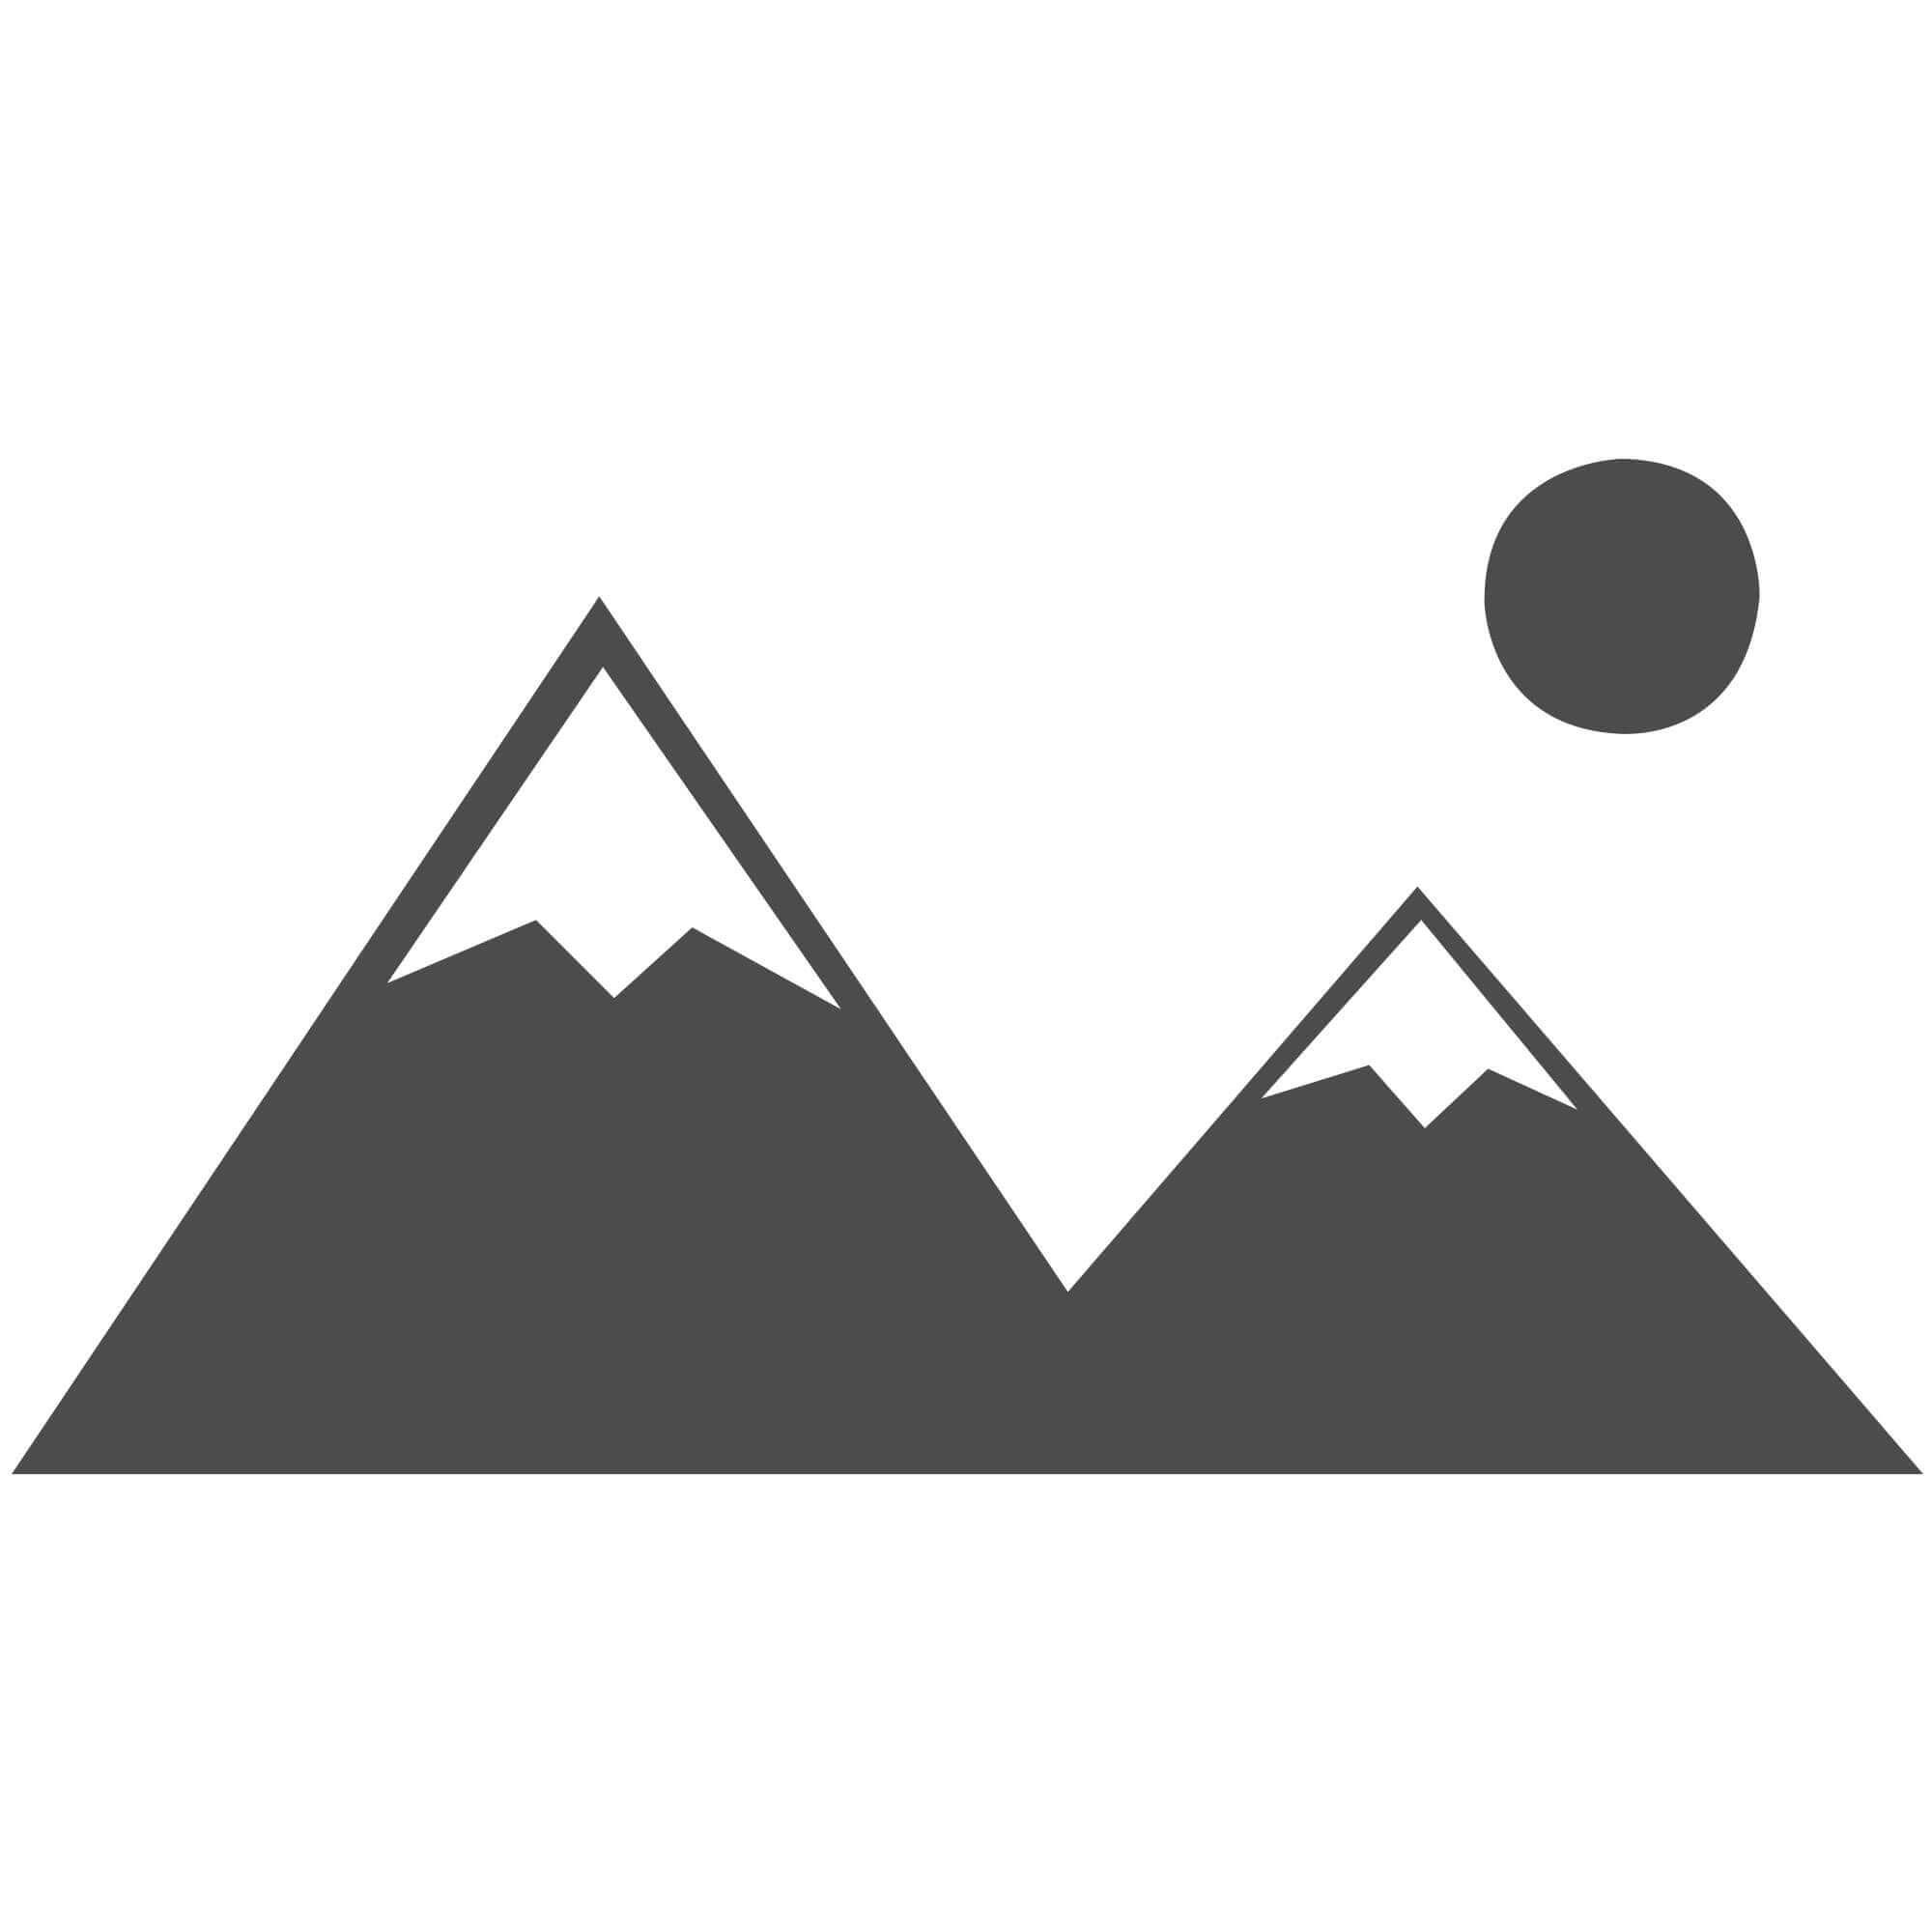 "Infinite Scope Purple Rug - Size 80 x 150 cm (2'8"" x 5')"